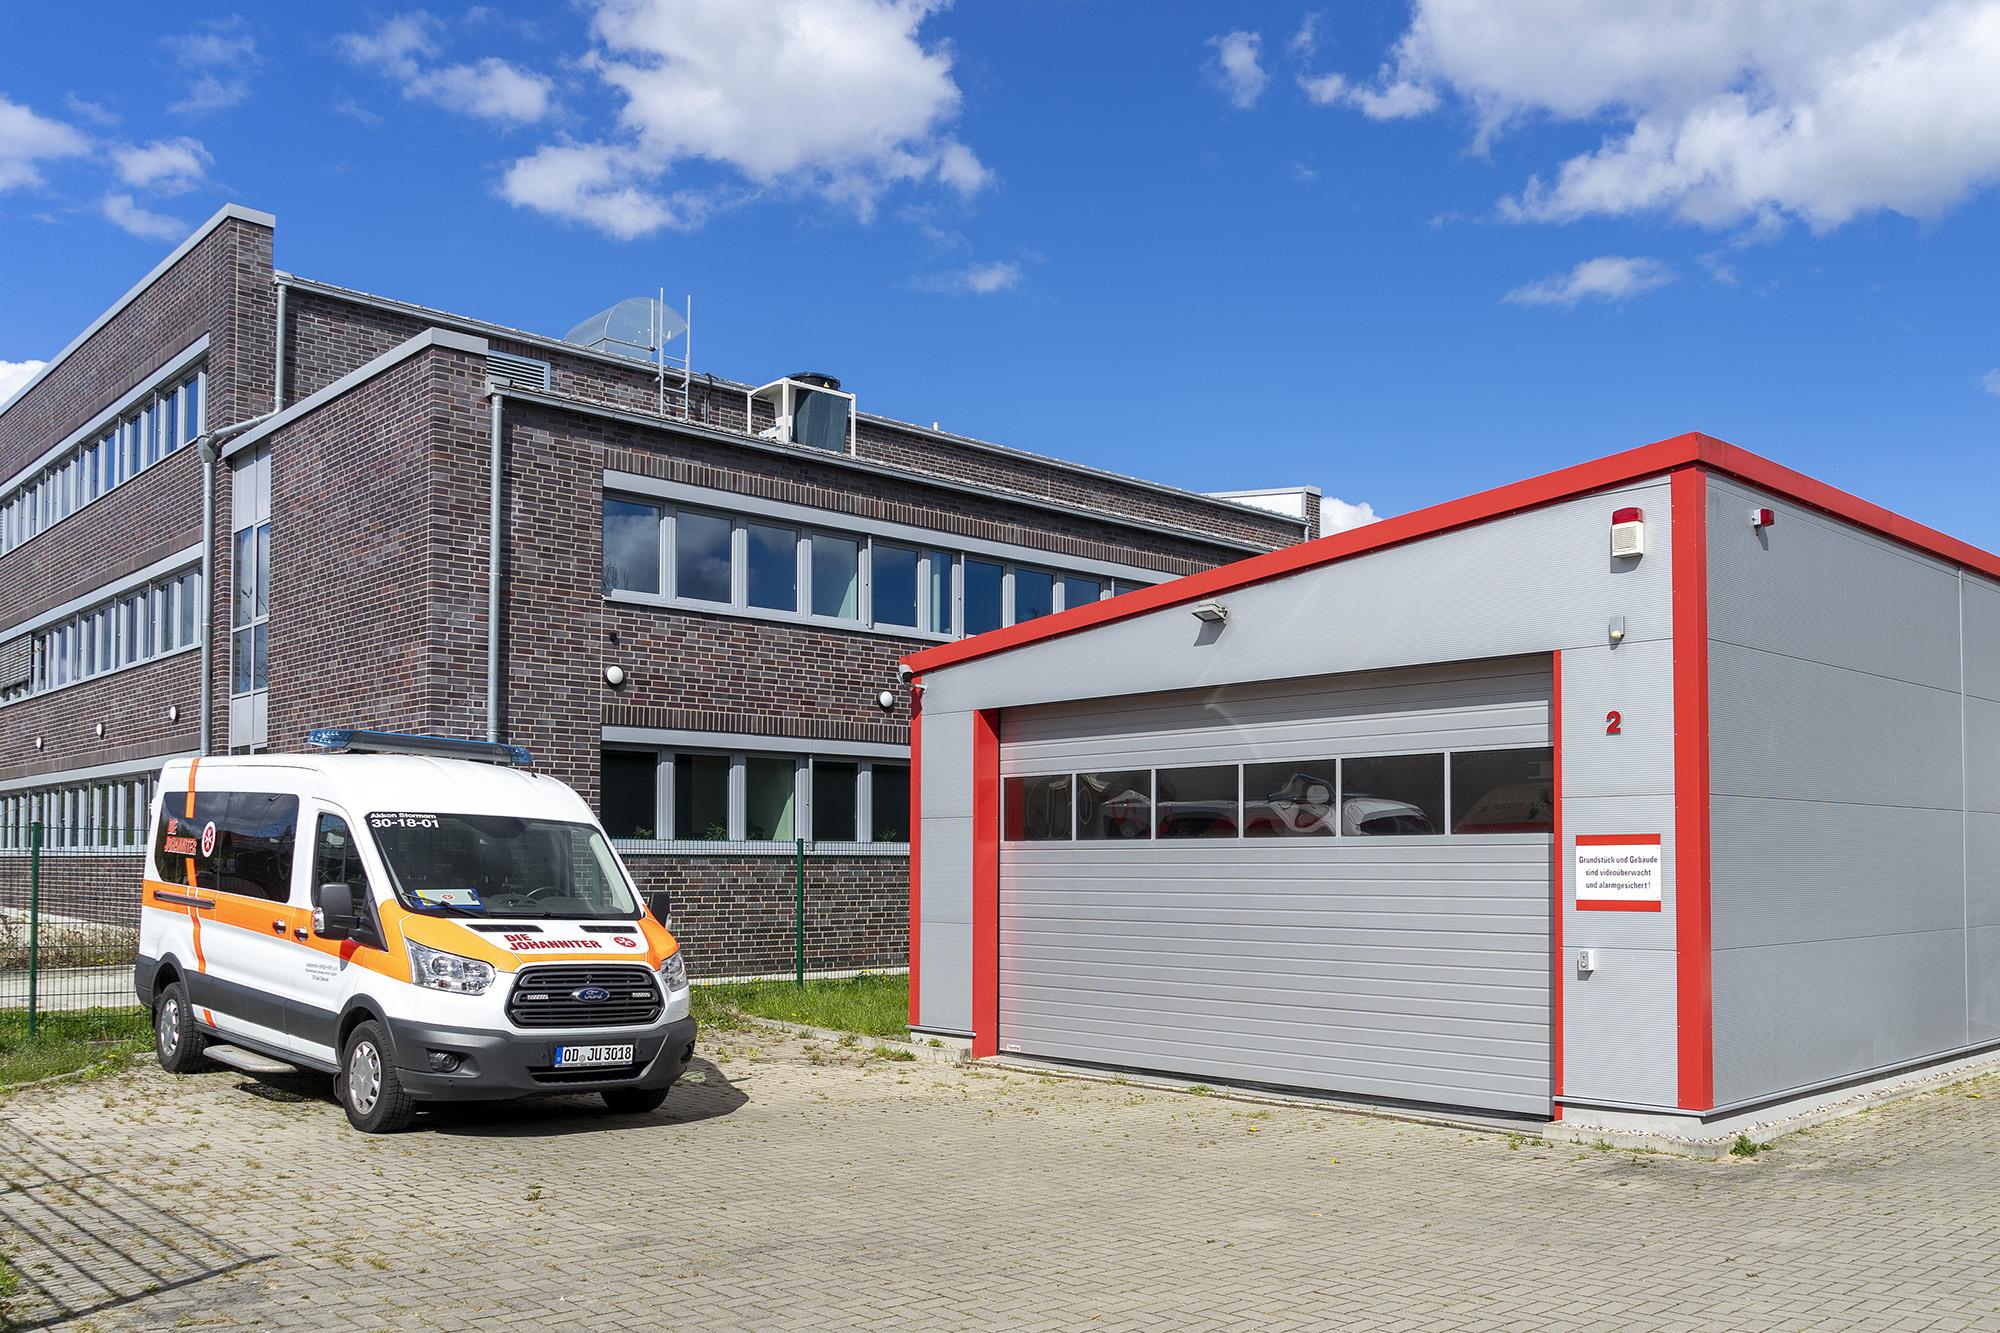 Dienststelle der Johanniter-Unfall-Hilfe in Bad Oldesloe